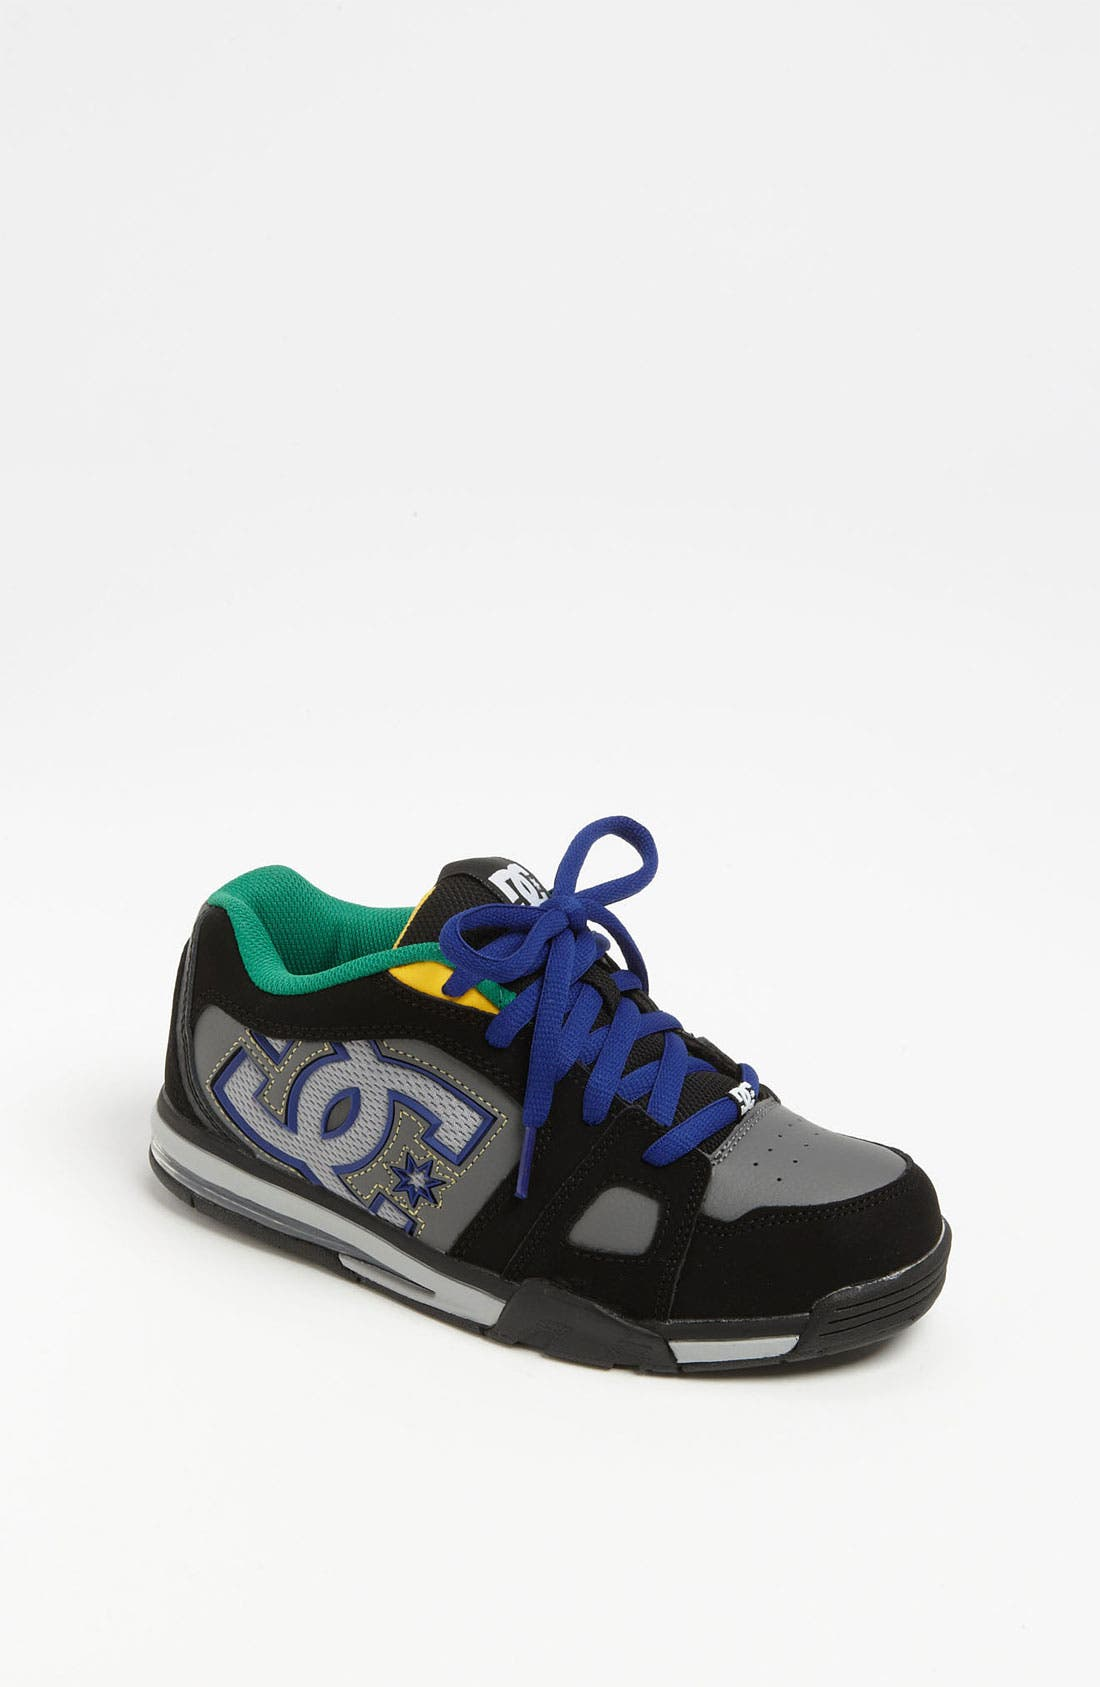 Main Image - DC Shoes 'Frenzy' Sneaker (Big Kid)